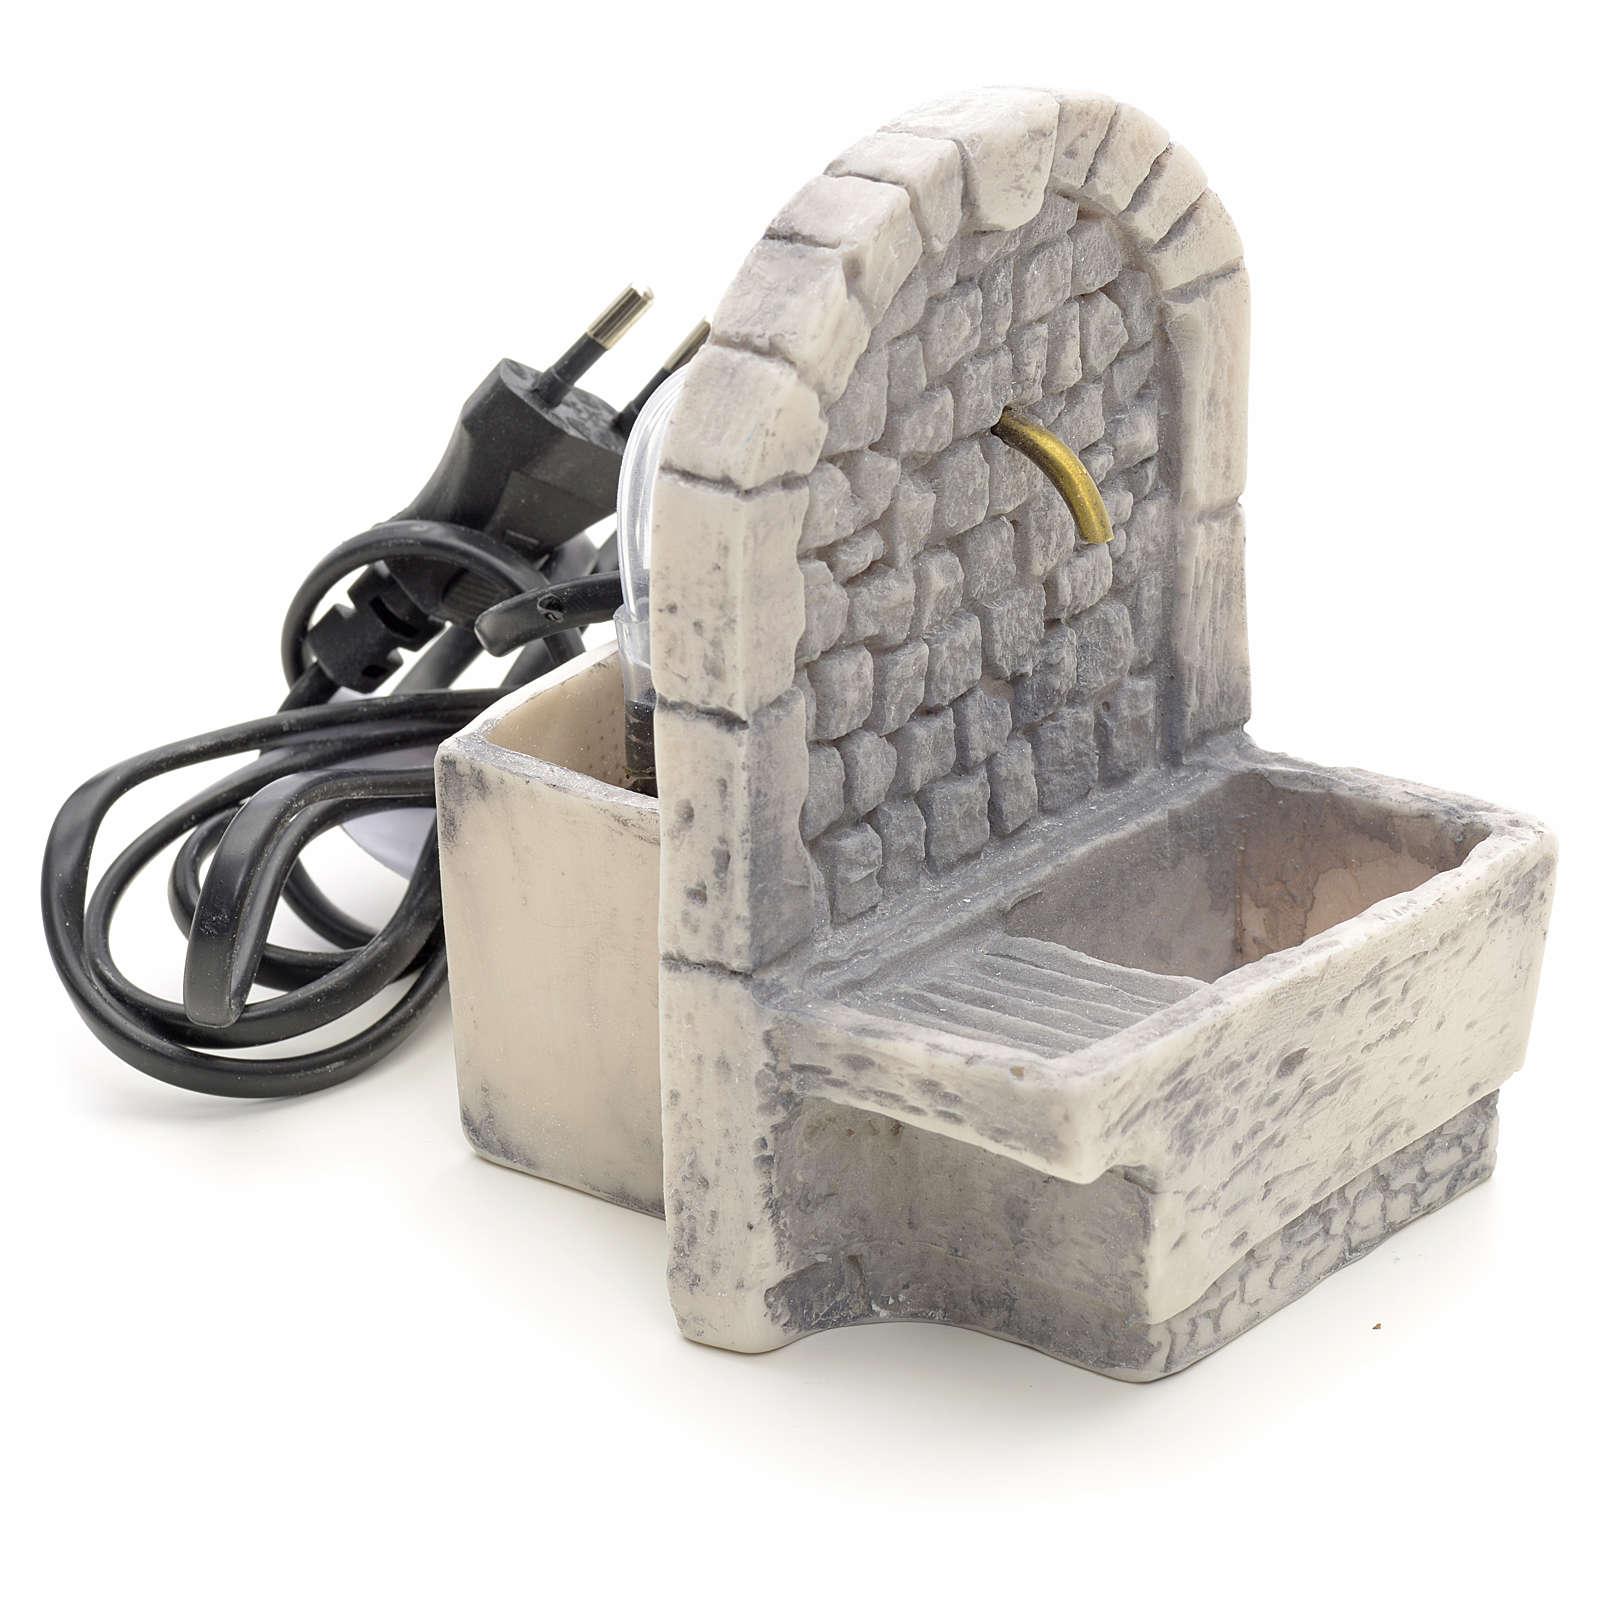 Fuente con batea para lavar en resina 13x10x10 4